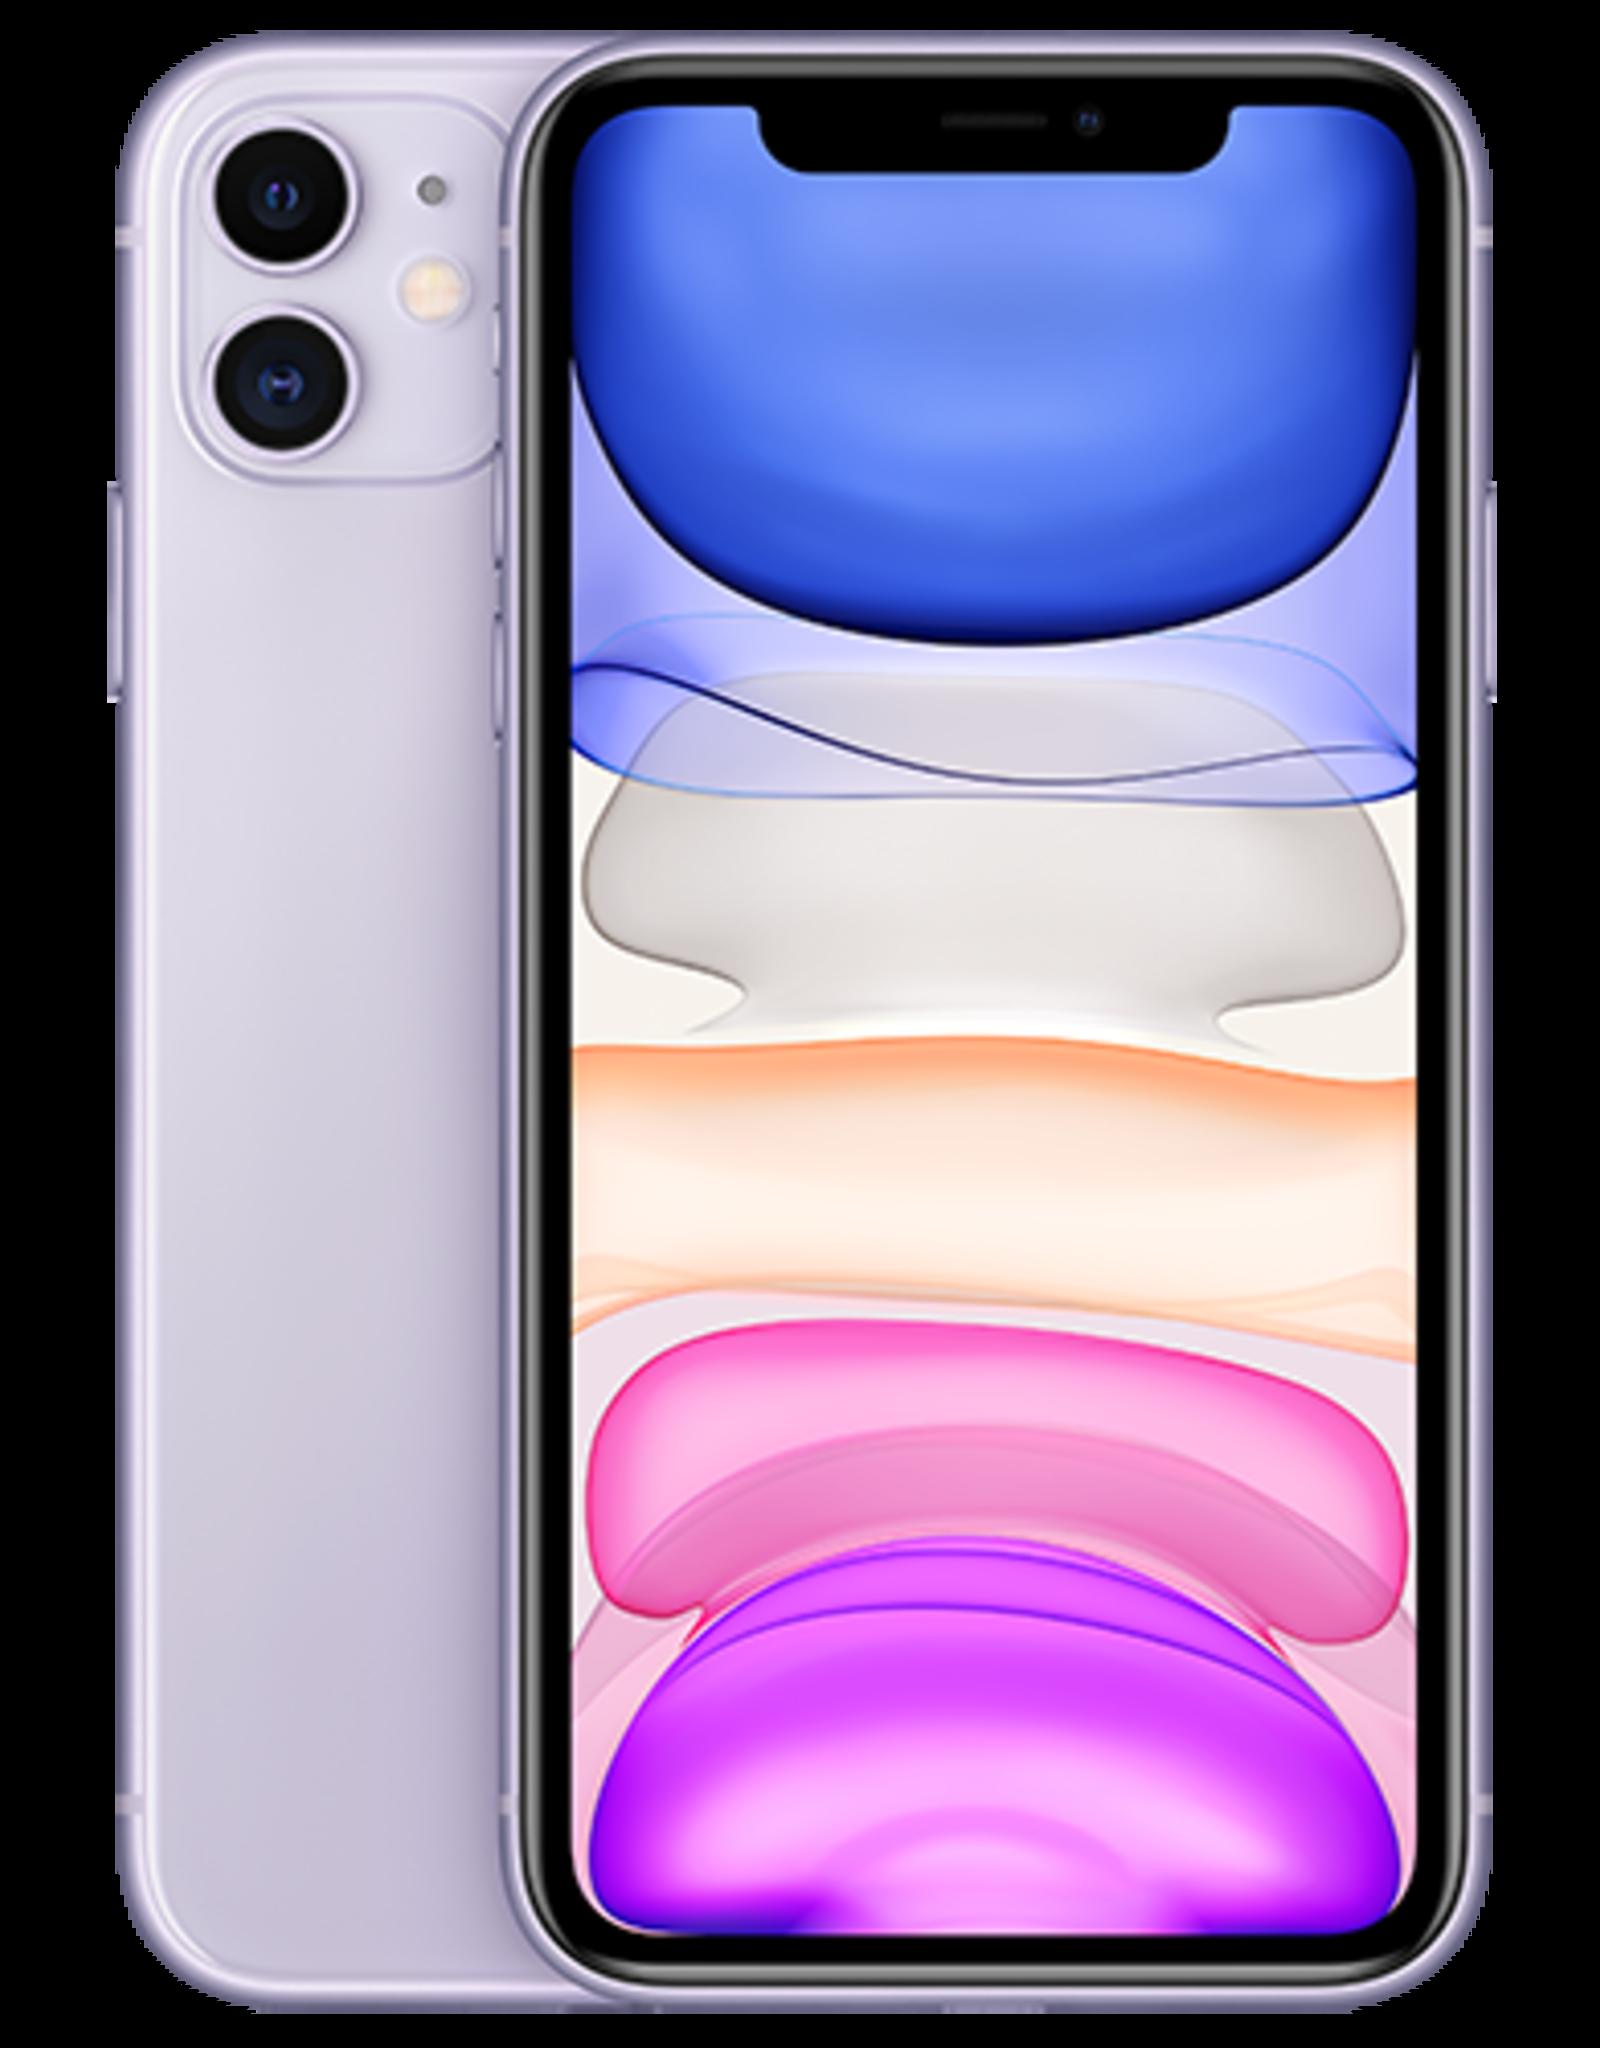 IPhone 11 | 64GB | PURPLE